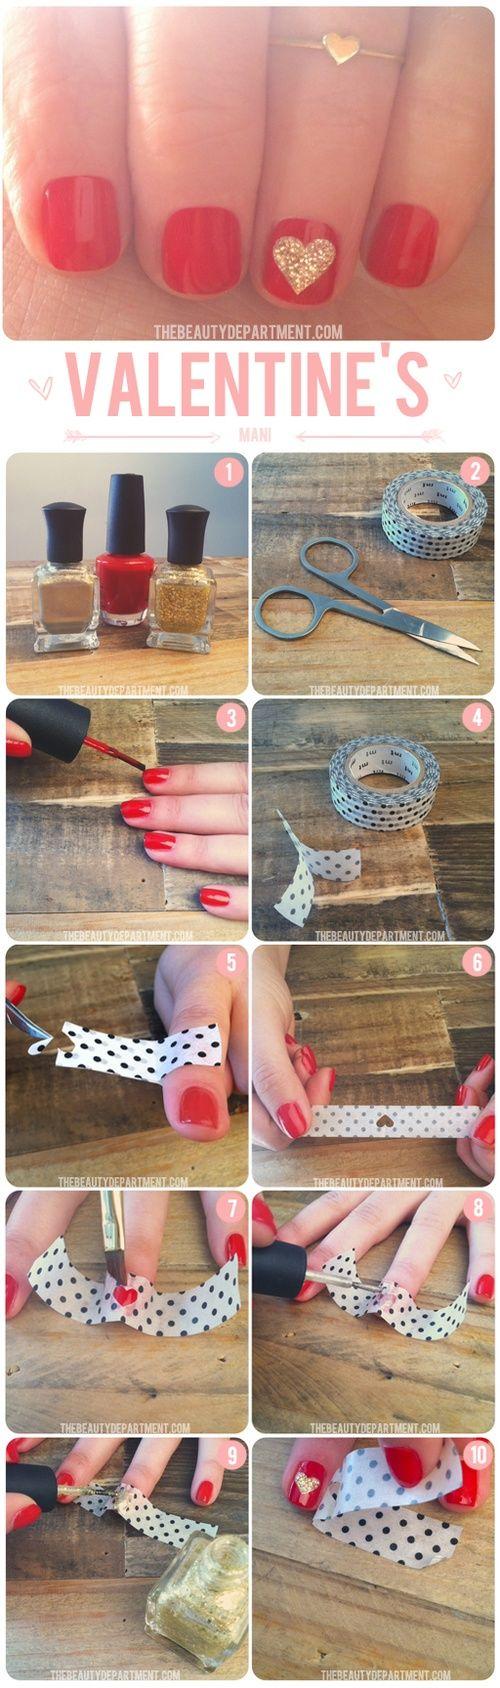 stencils-nails